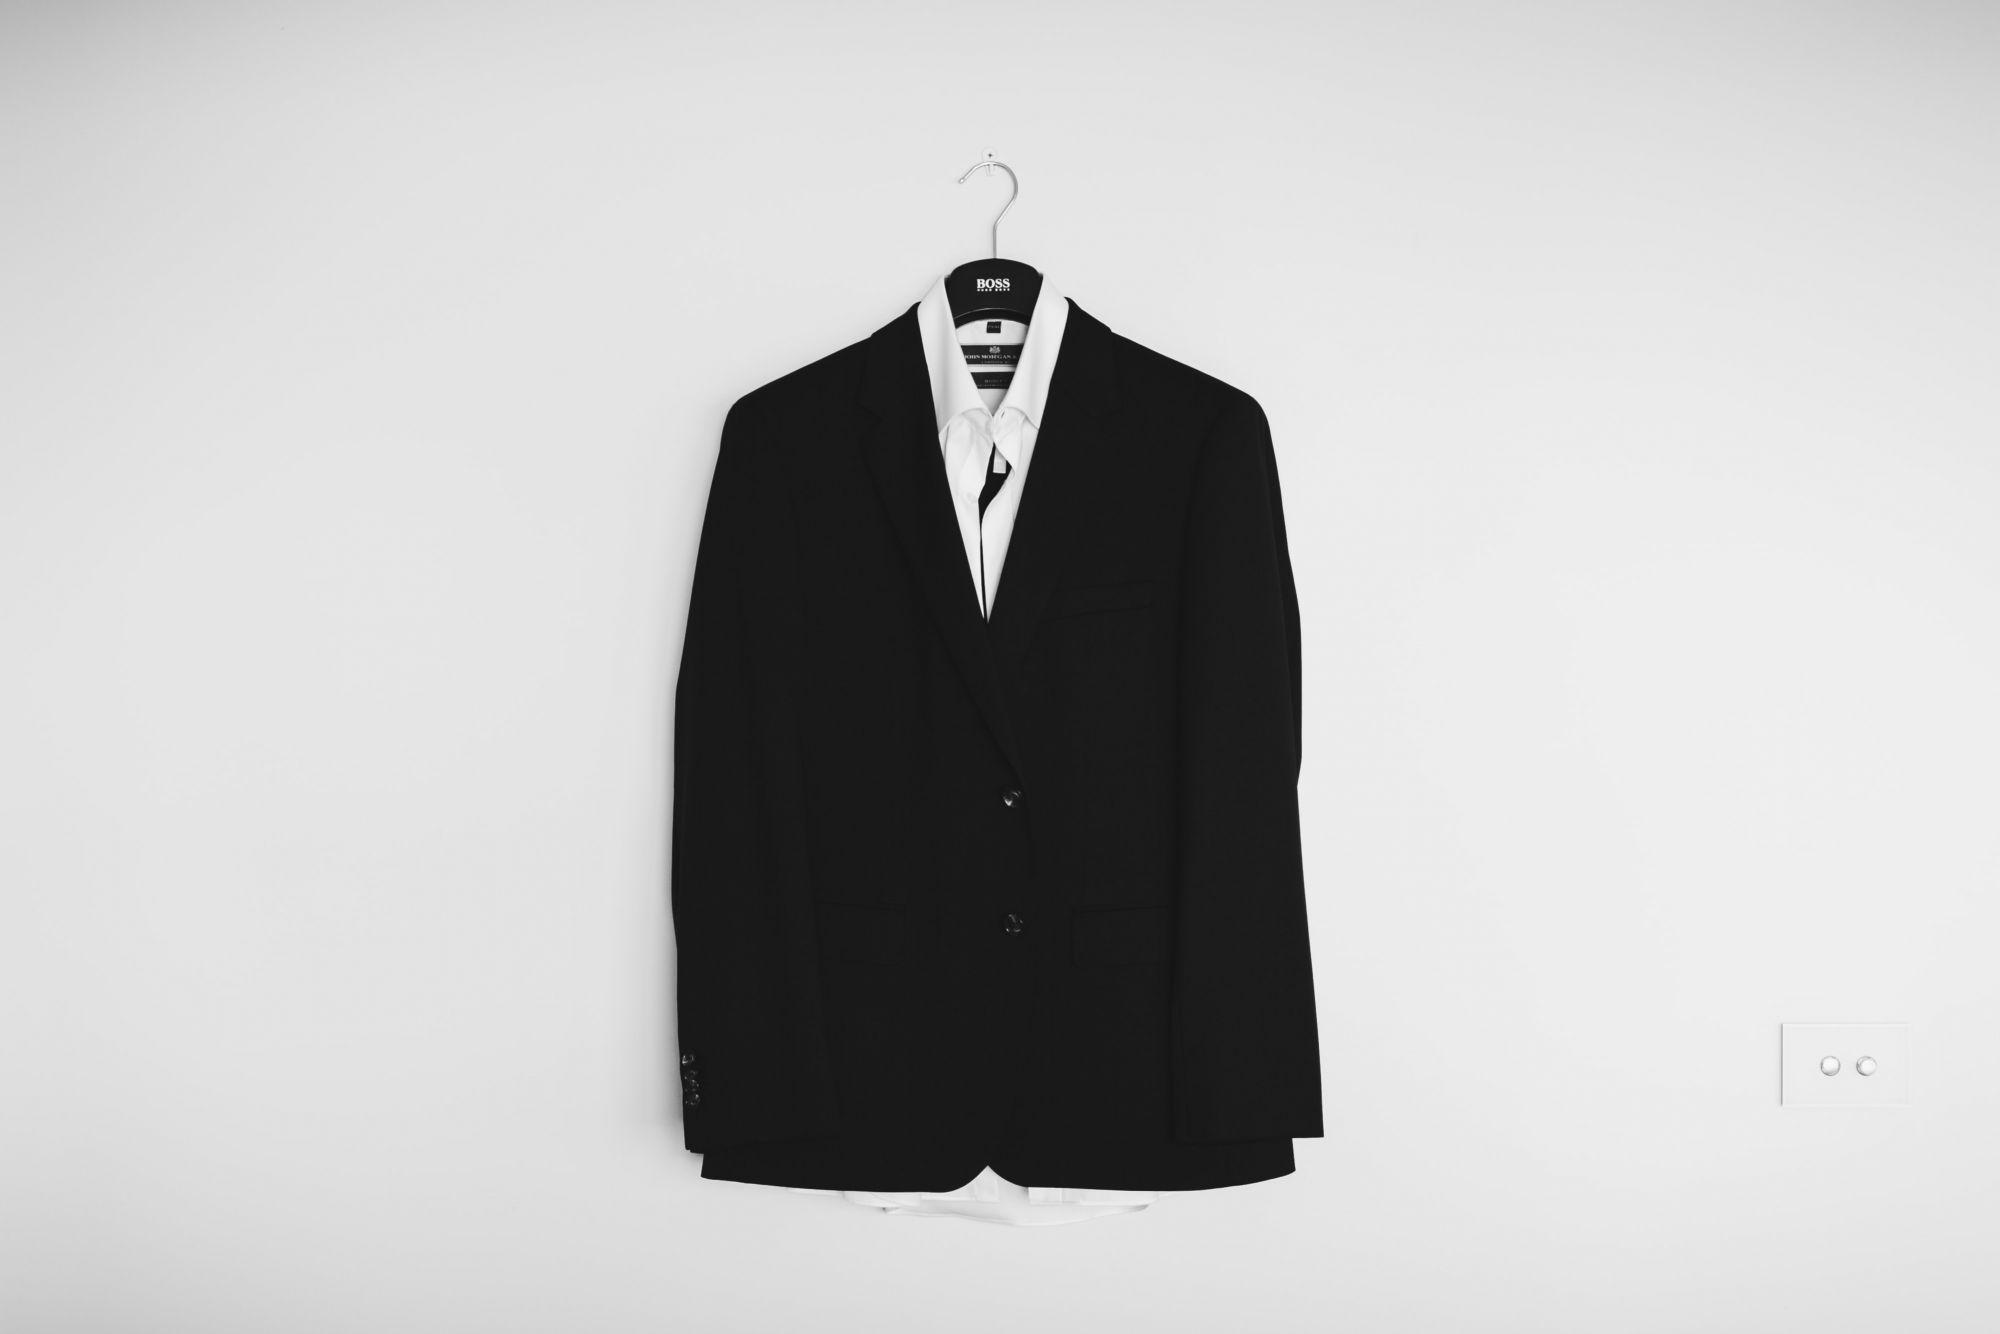 Hugo Boss Unveils Its First Vegan Suit